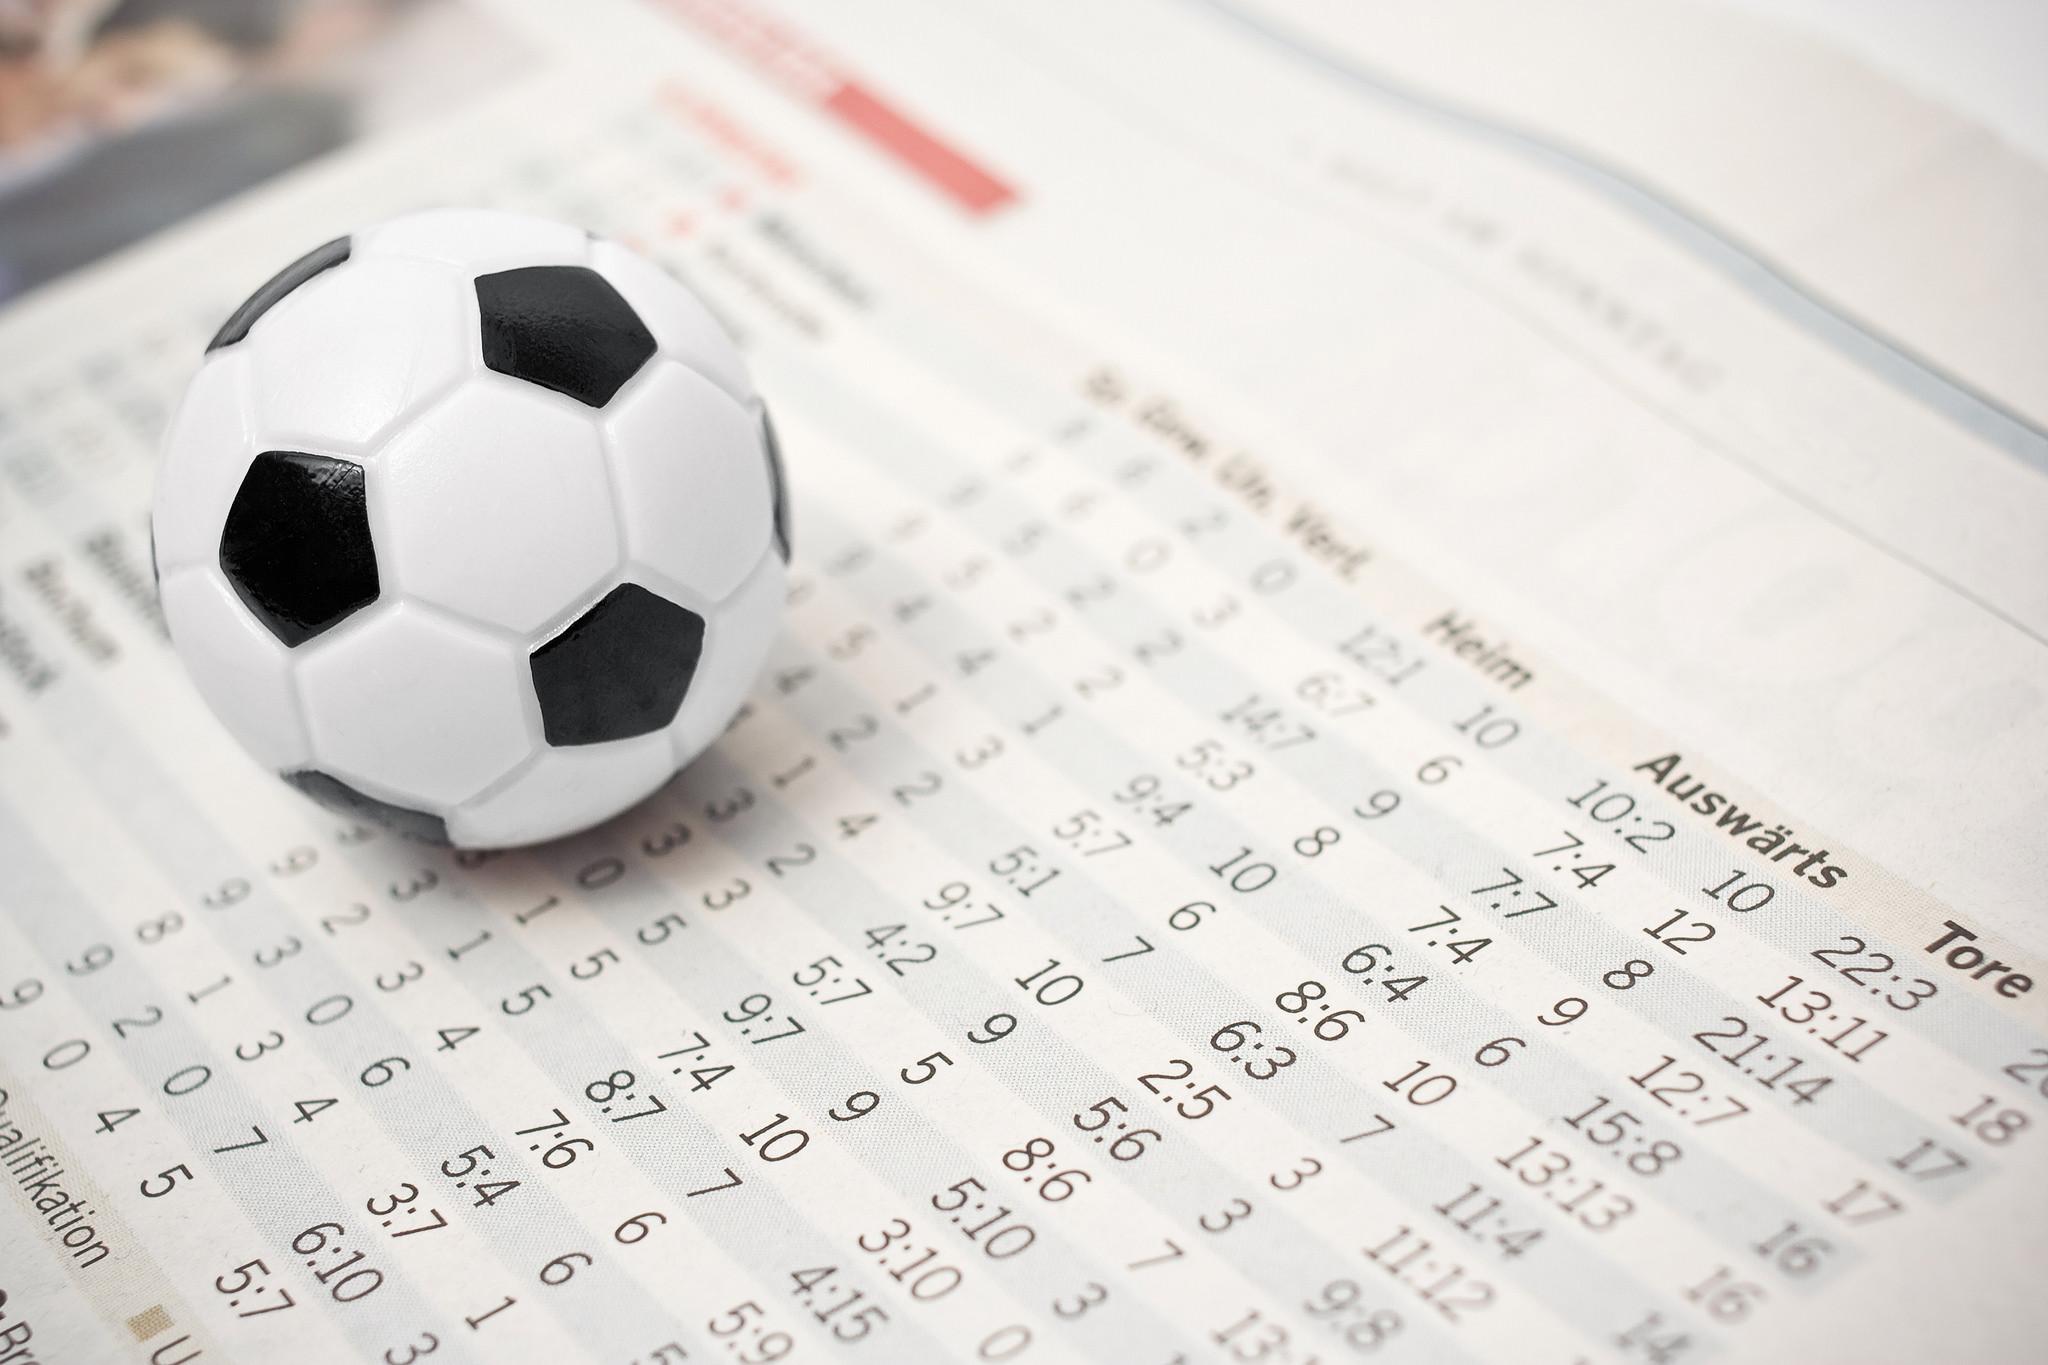 apuesta-deportiva-dinero-datos-estadistica